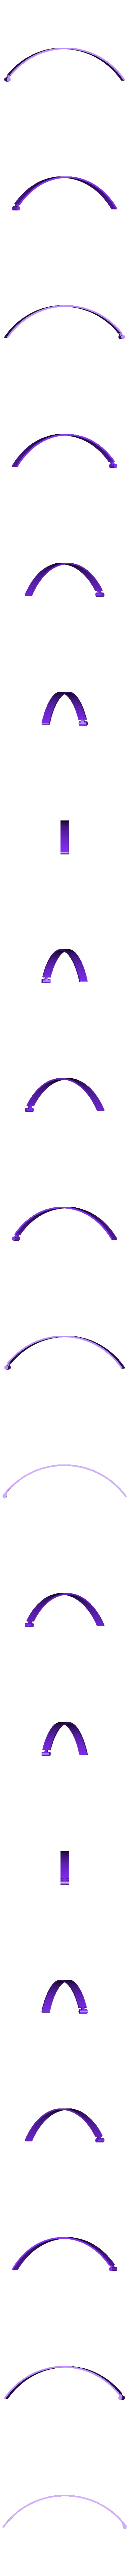 bag_clip_120mm_inside.stl Download free SCAD file Customizable Bag Clip • 3D printable design, WalterHsiao